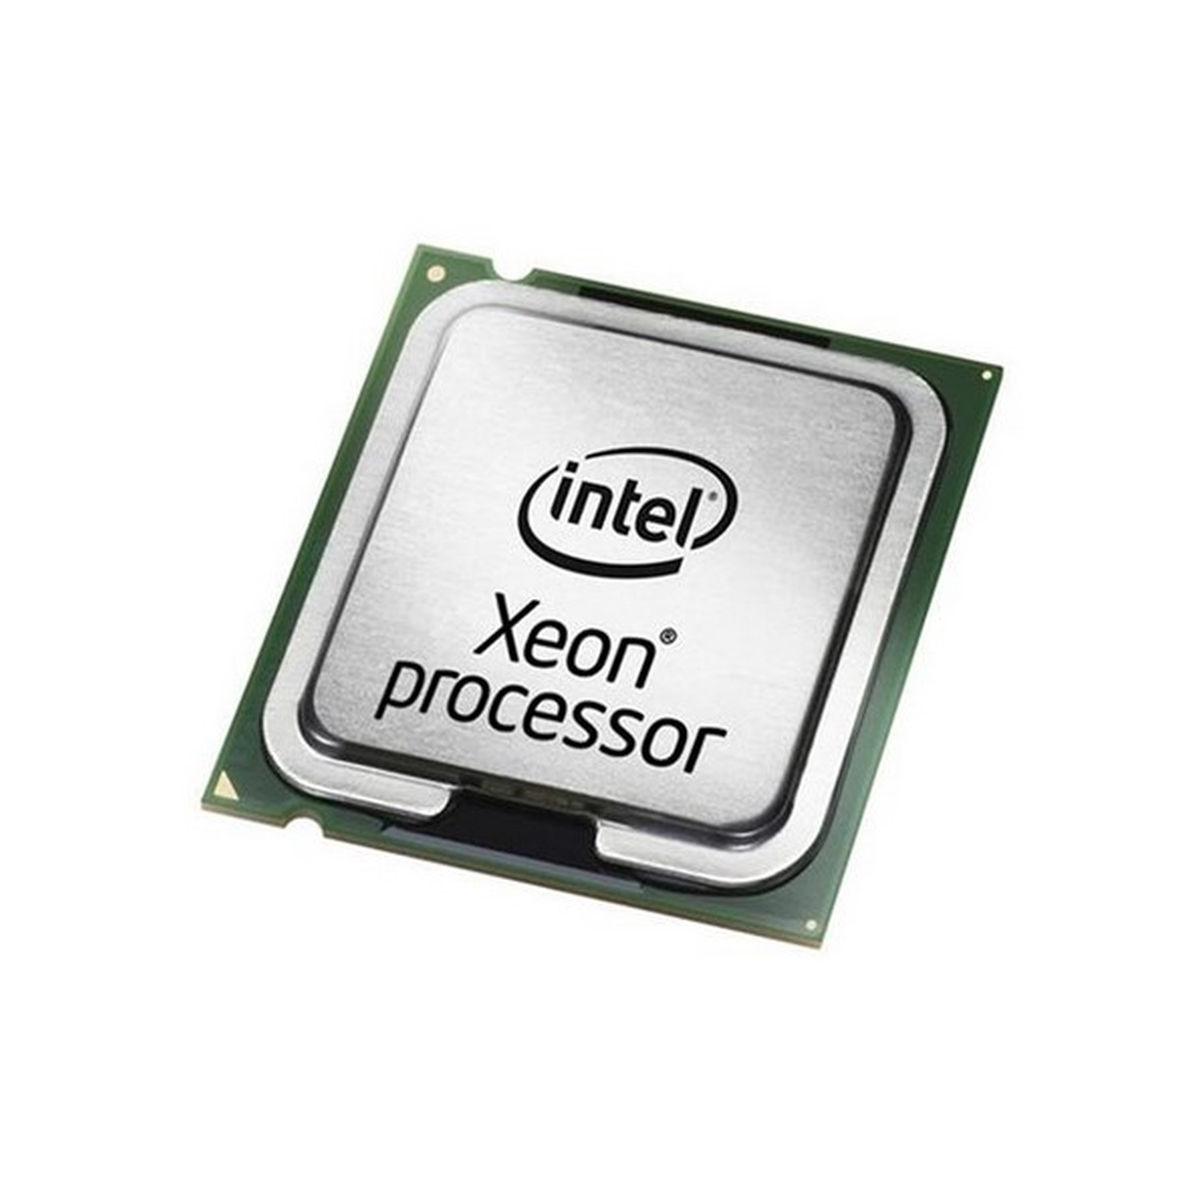 PROCESOR INTEL XEON E7-4830 8x2.13GHz  LGA1567